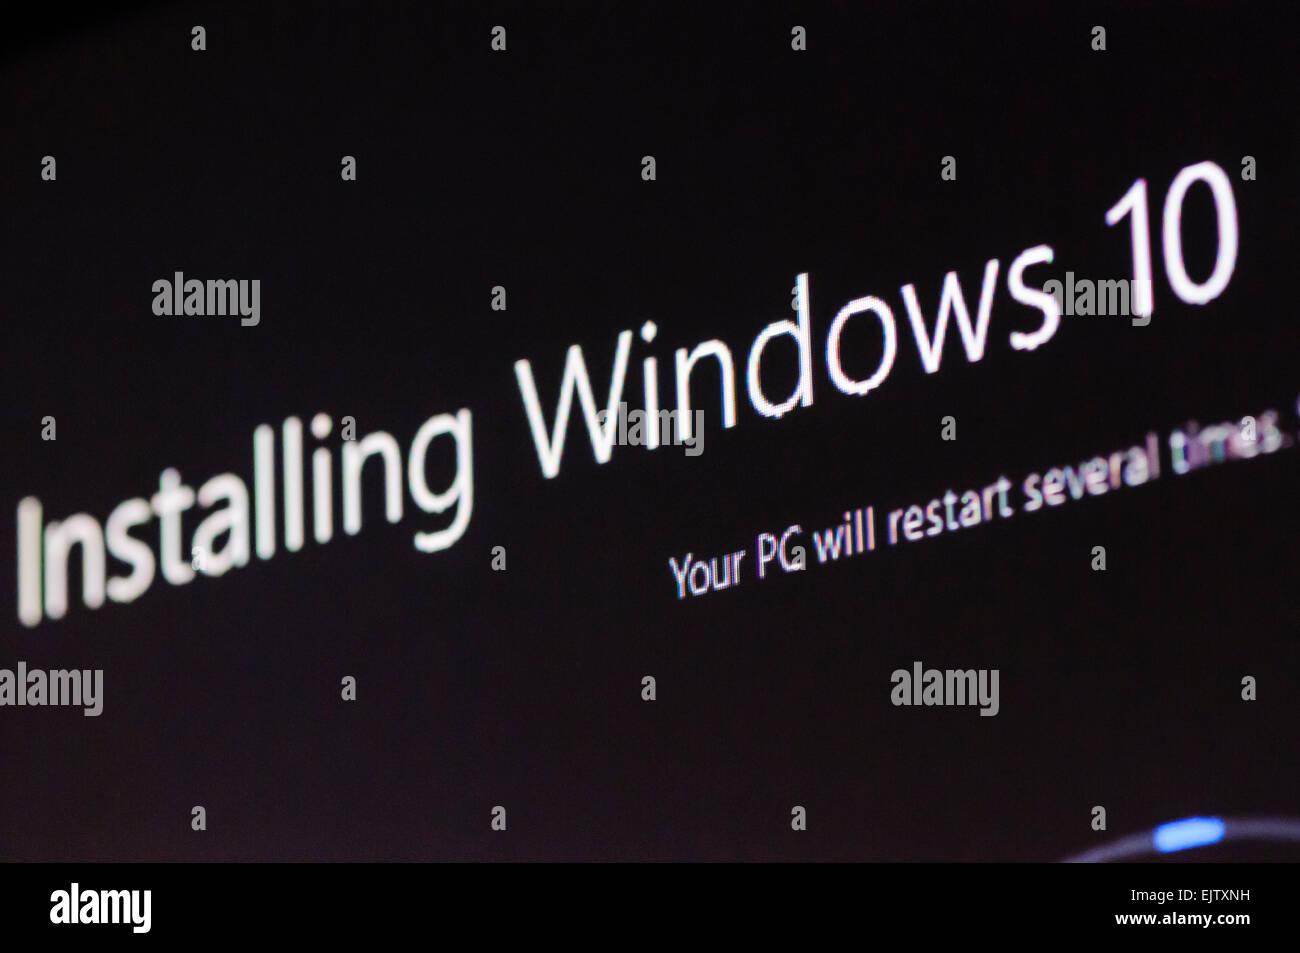 Installing Windows 10. - Stock Image